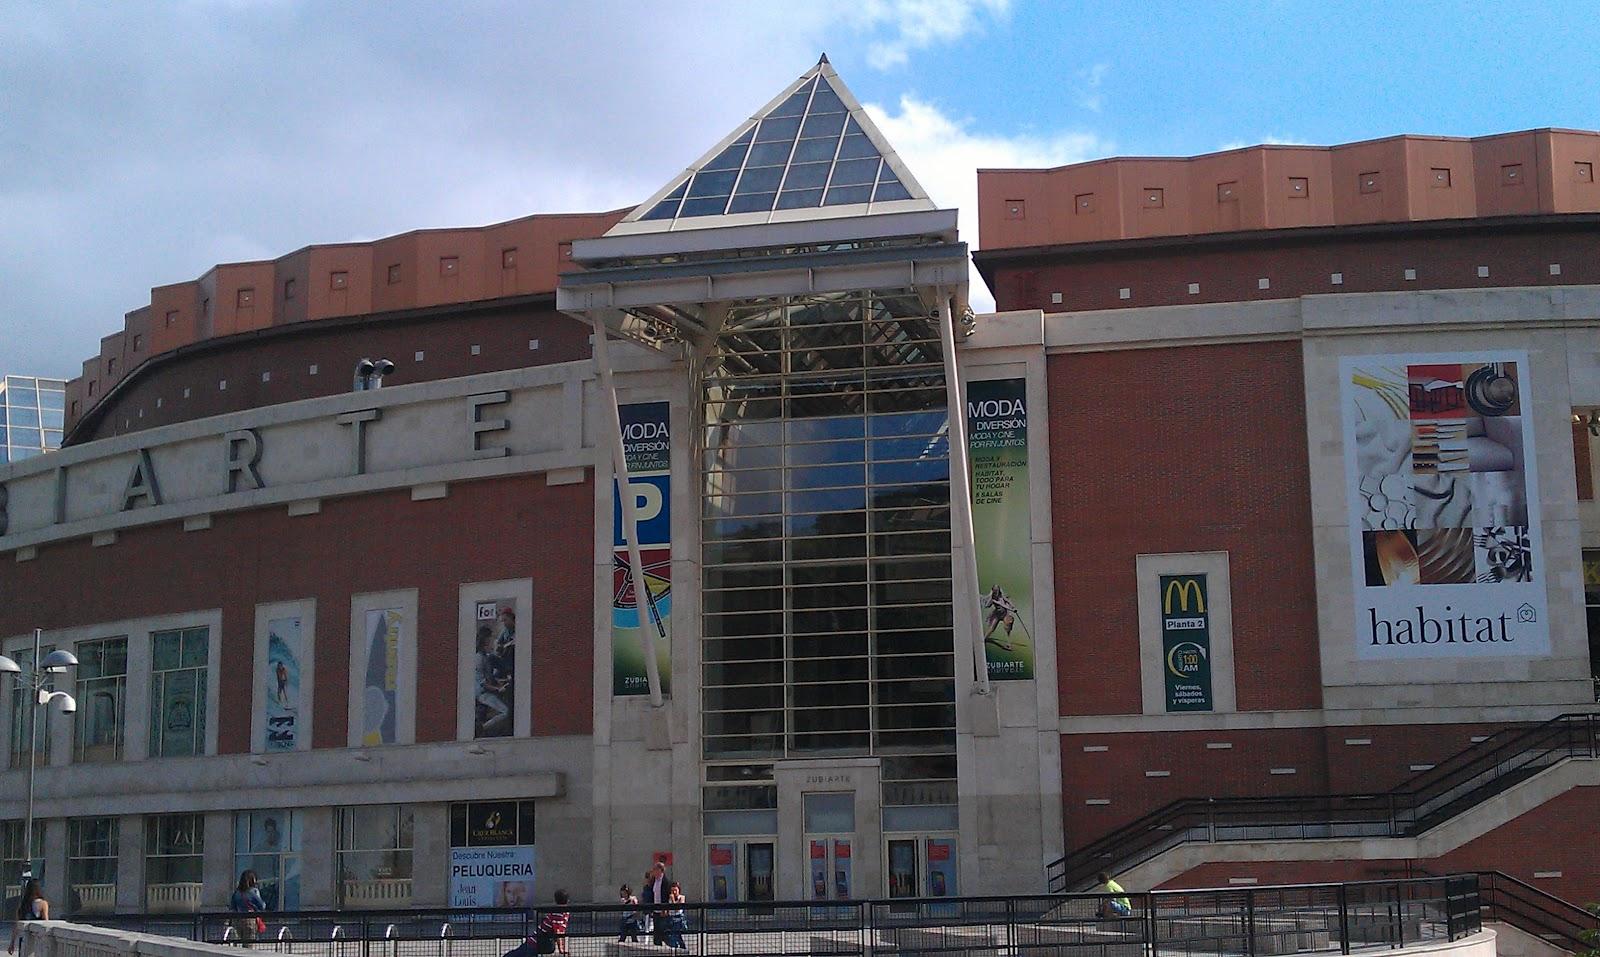 Edificios de bilbao centro comercial zubiarte fast food - Clinica guimon bilbao ...